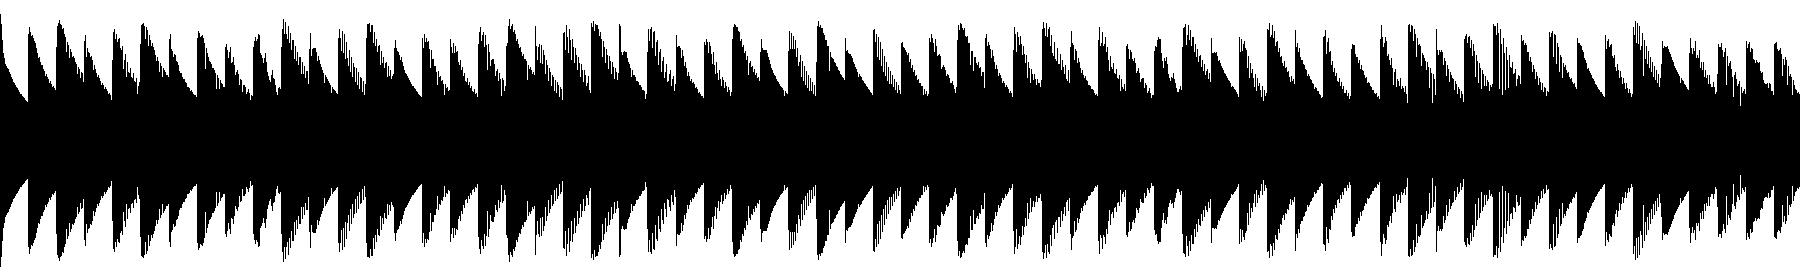 seq10 145